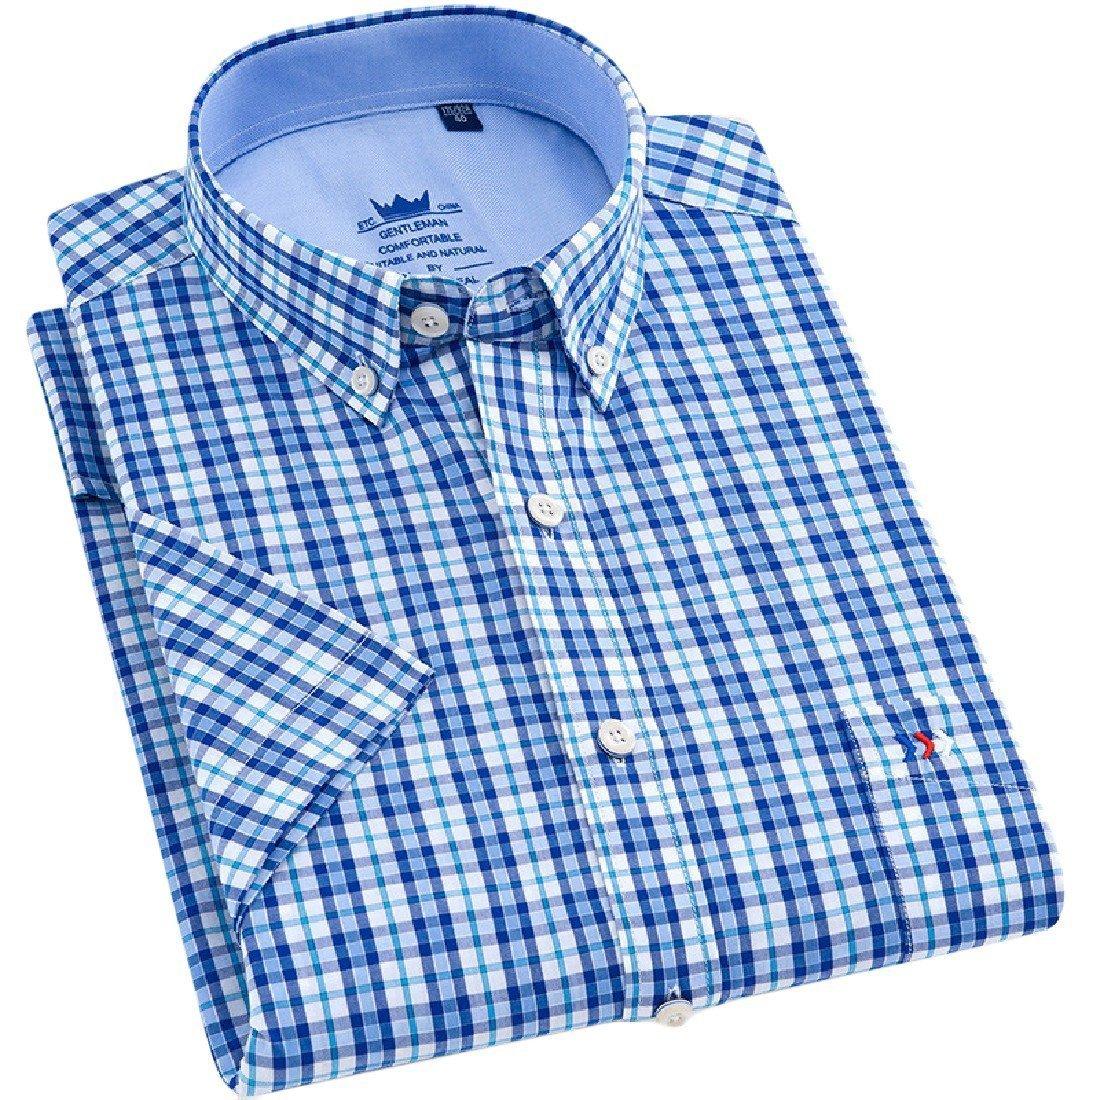 YUNY Men Cotton Oversize Summer Short-Sleeve Leisure Button Down Shirt 13 L